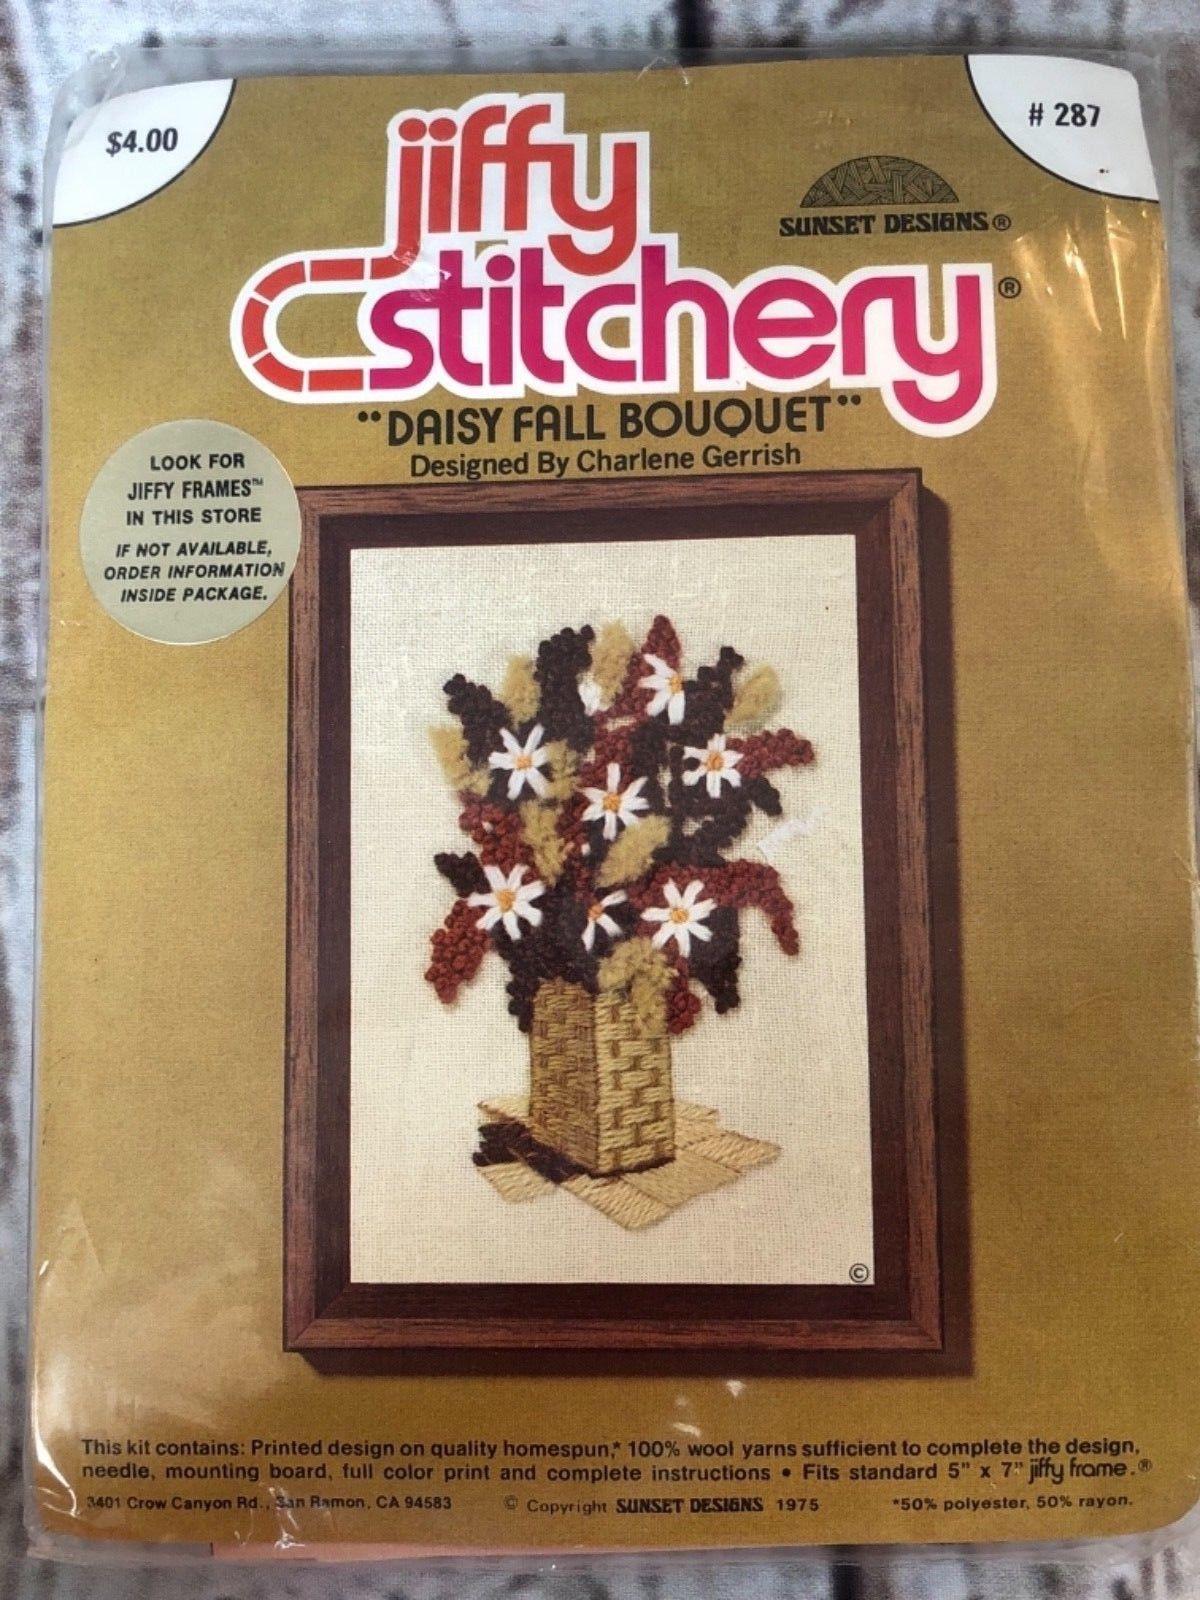 Jiffy Stitchery DAISY FALL BOUQUET  Vintage 70s Crewel Embroidery Kit - $9.50